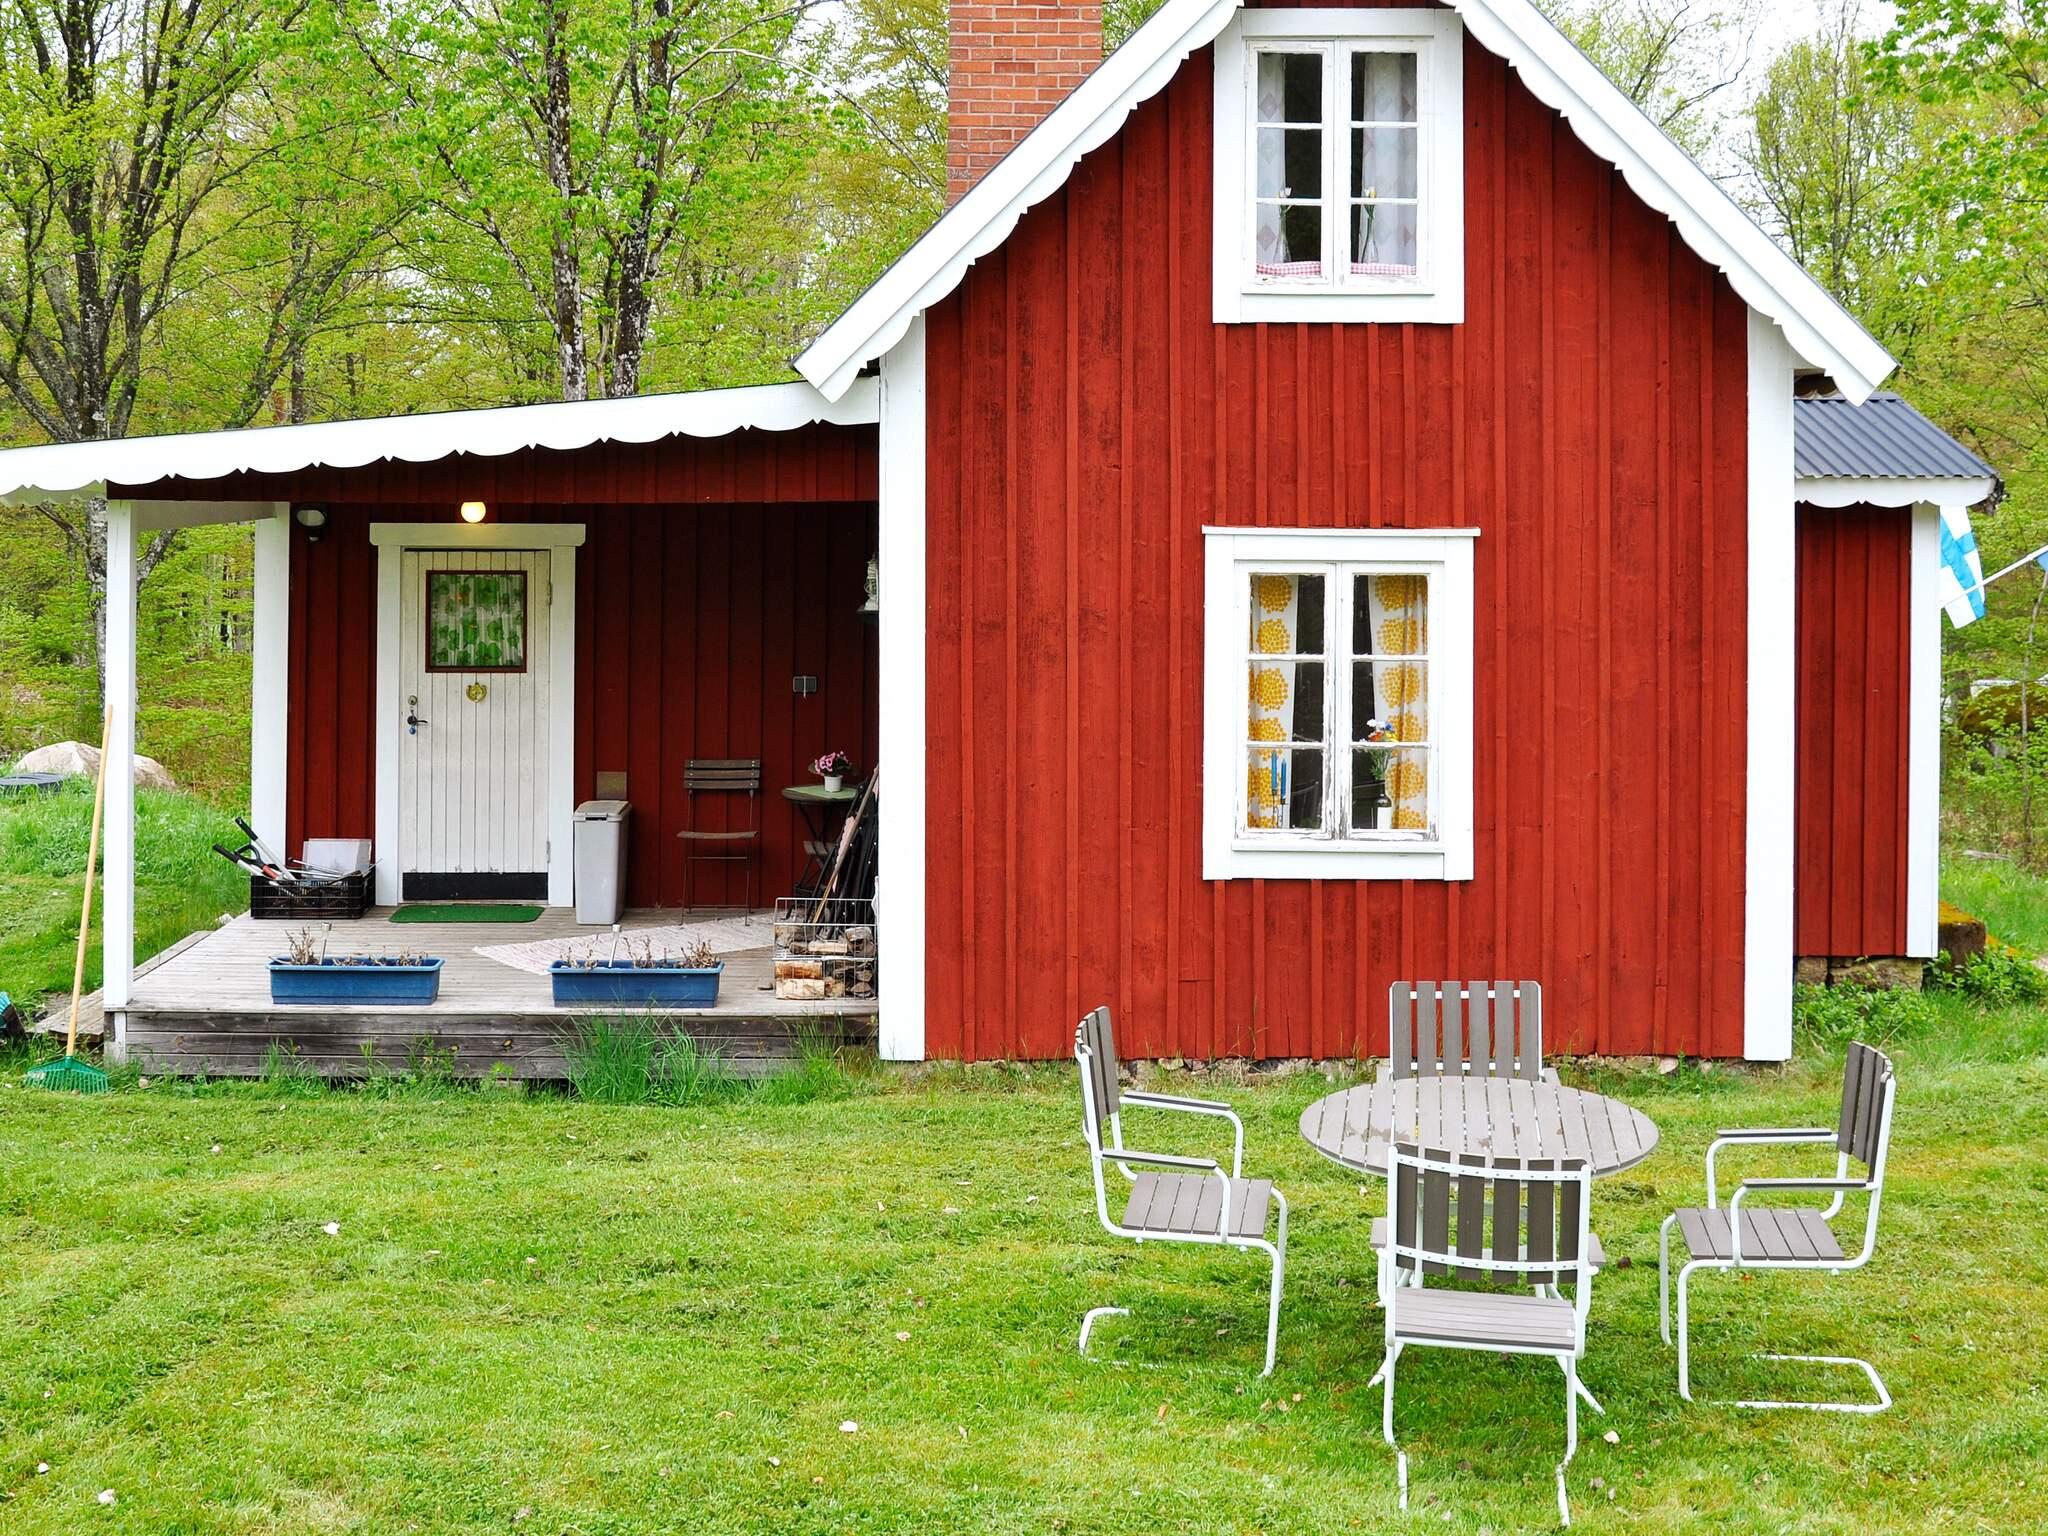 Ferienhaus Karlskrona (2624317), Eringsboda, Blekinge län, Südschweden, Schweden, Bild 13